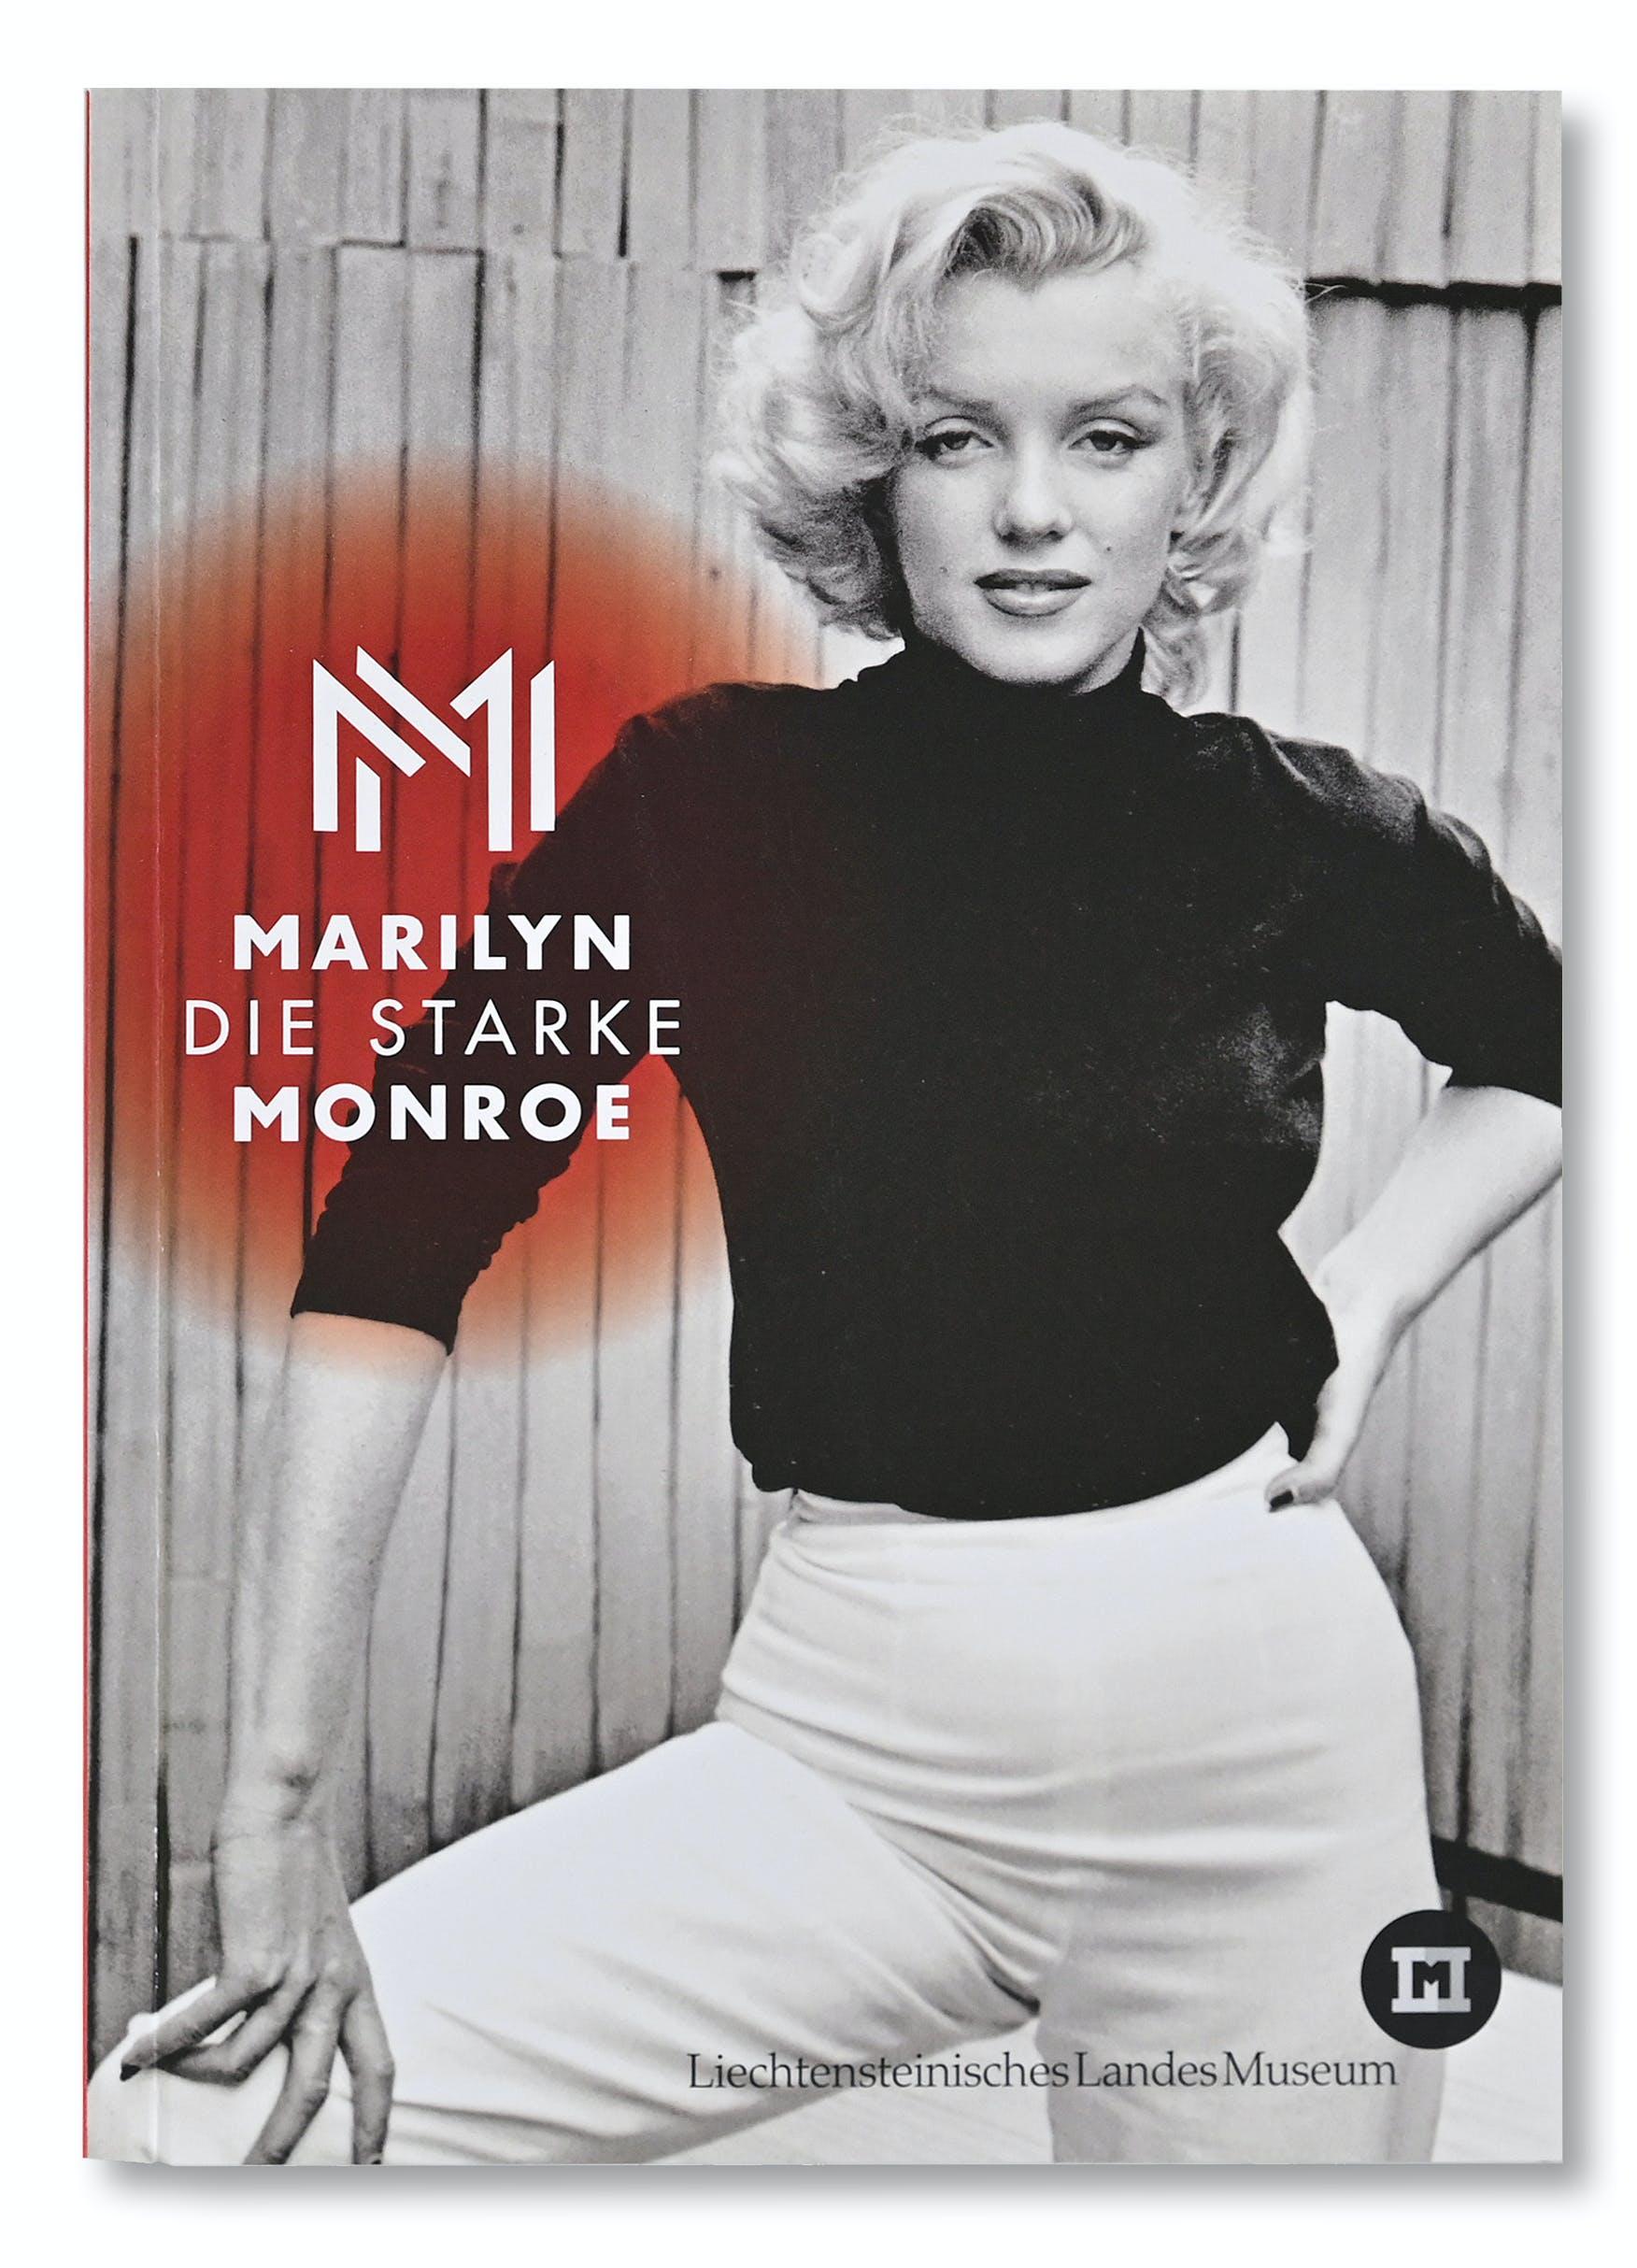 Publikation Marilyn die starke Monroe